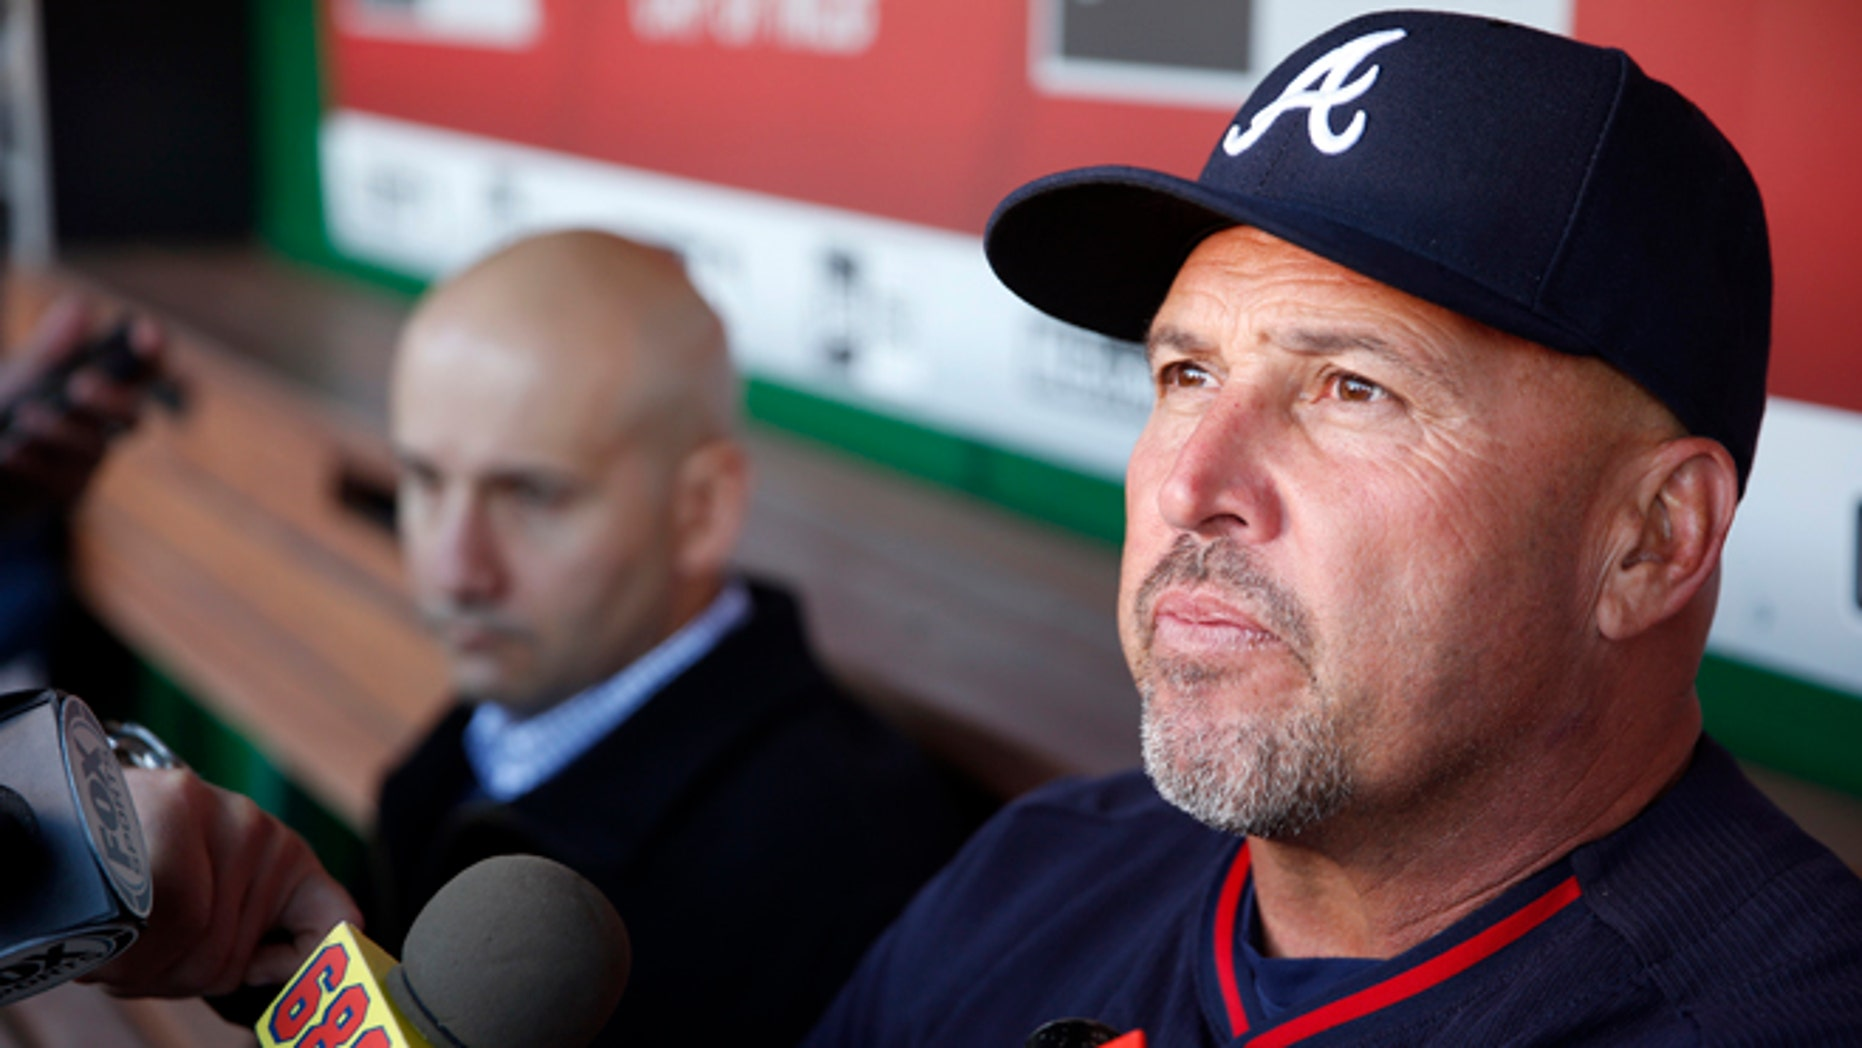 Former Atlanta Braves manager Fredi Gonzalez on April 13, 2016.